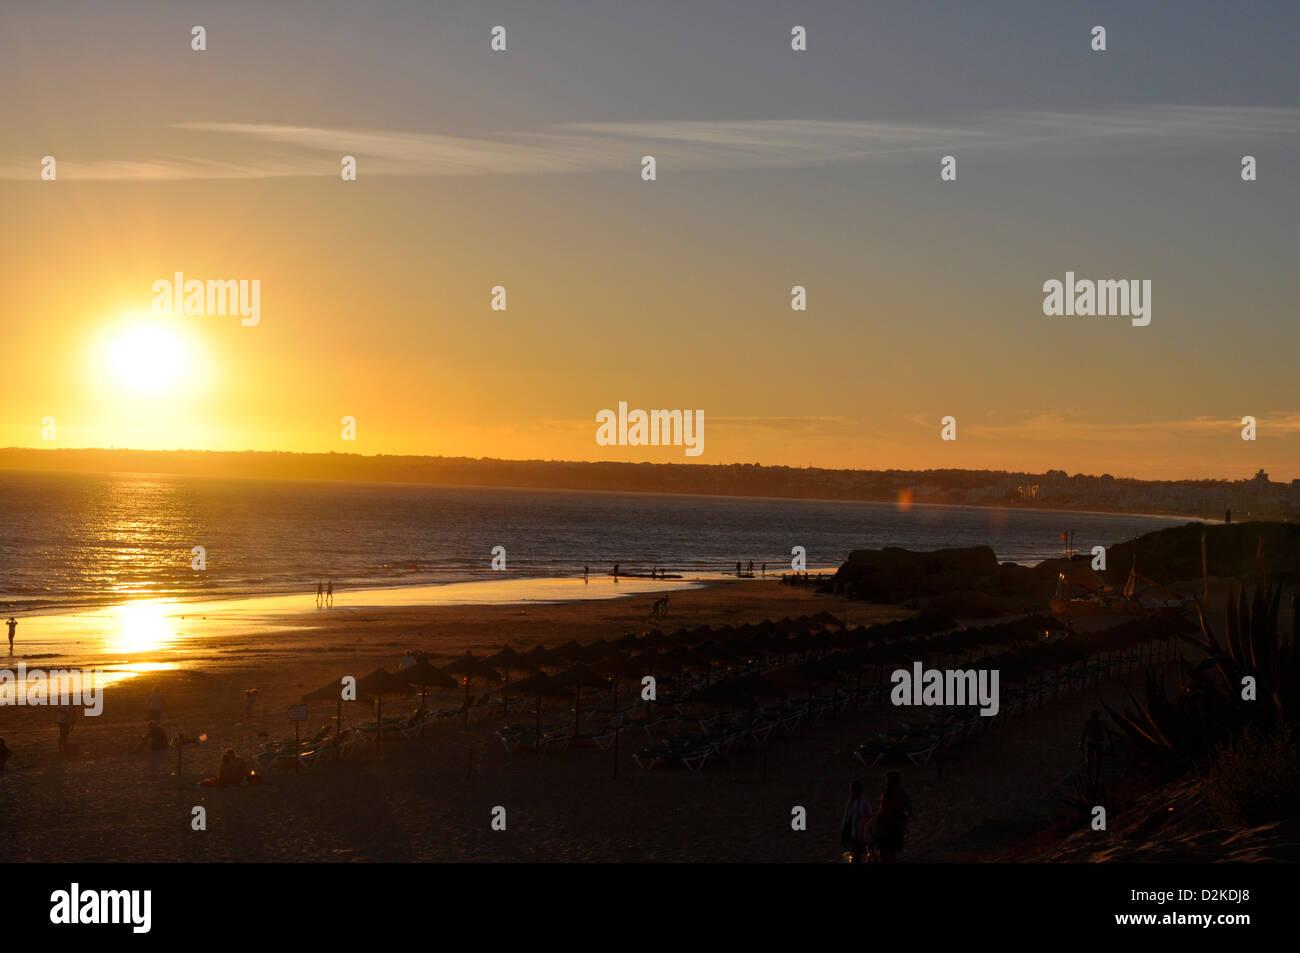 Sunset in Gale, Faro District, Algarve Region, Portugal - Stock Image